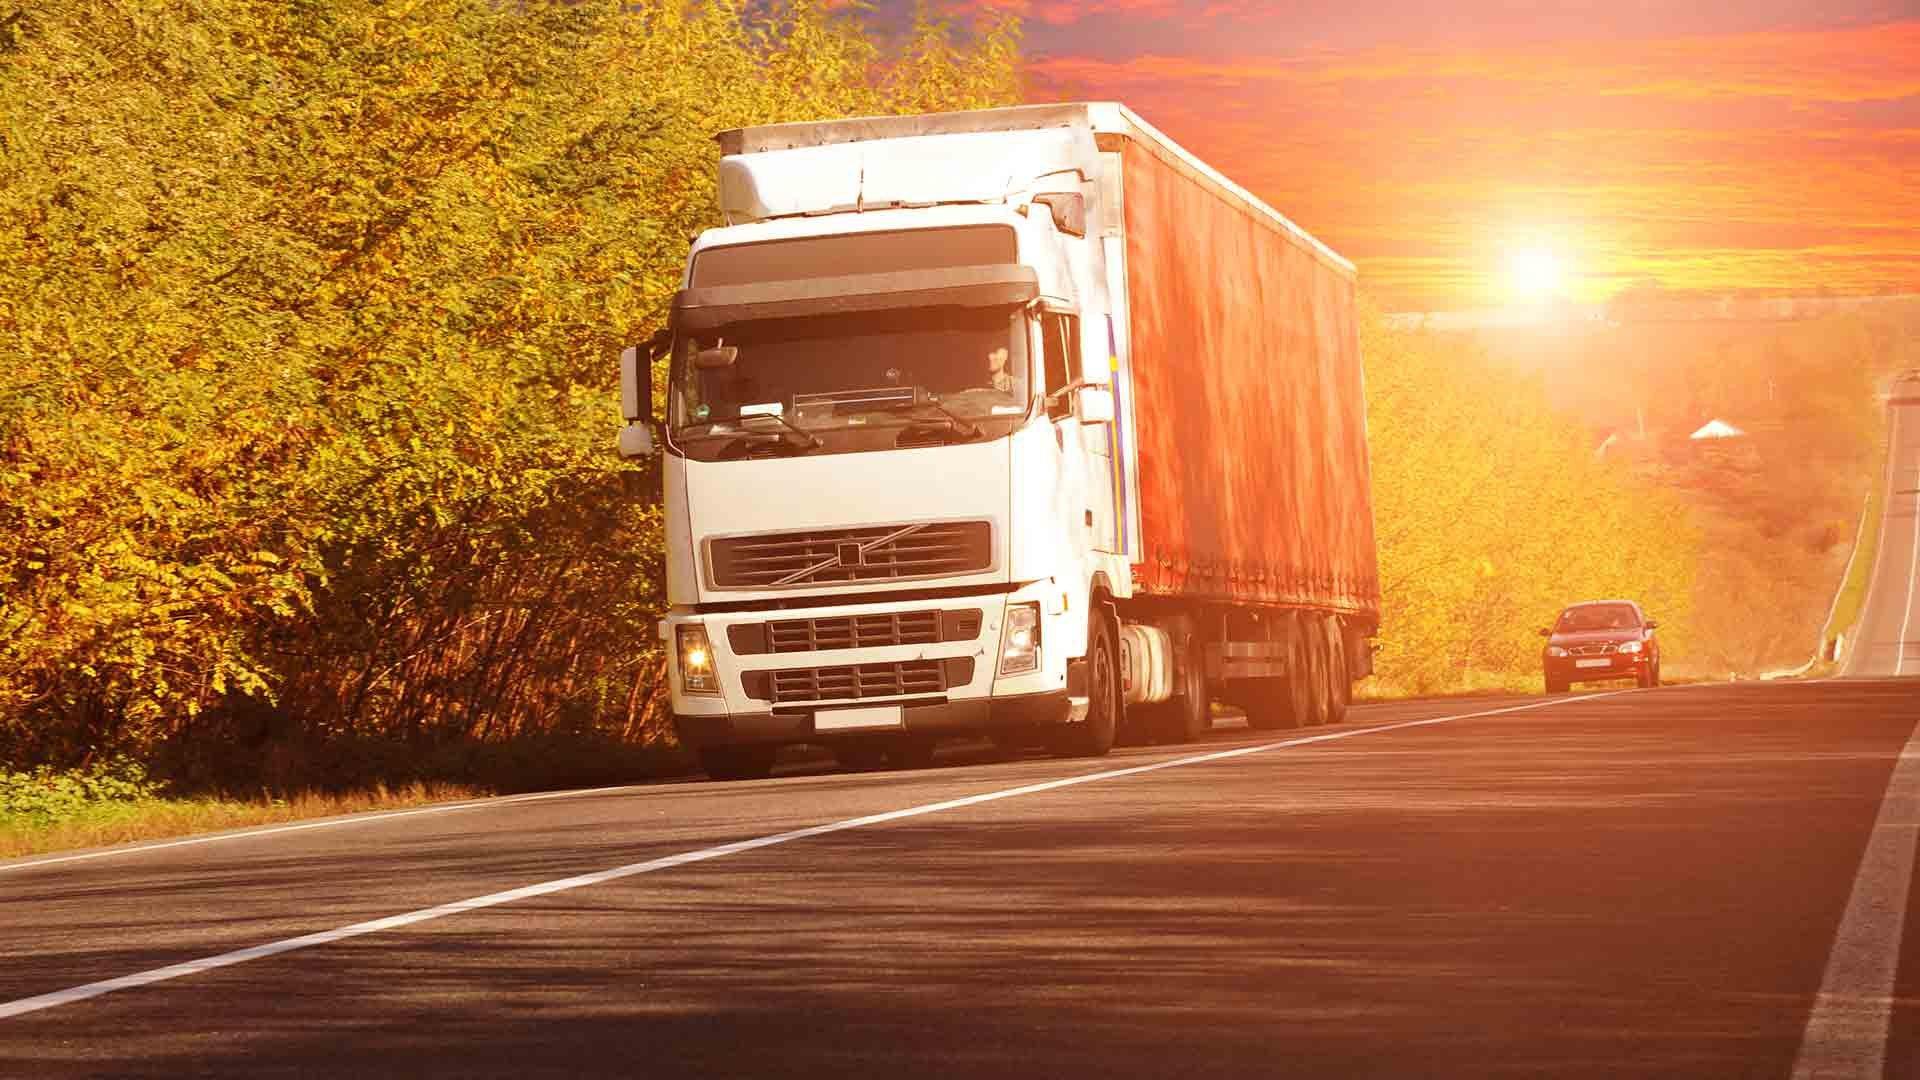 adelantar-vehiculos-pesados